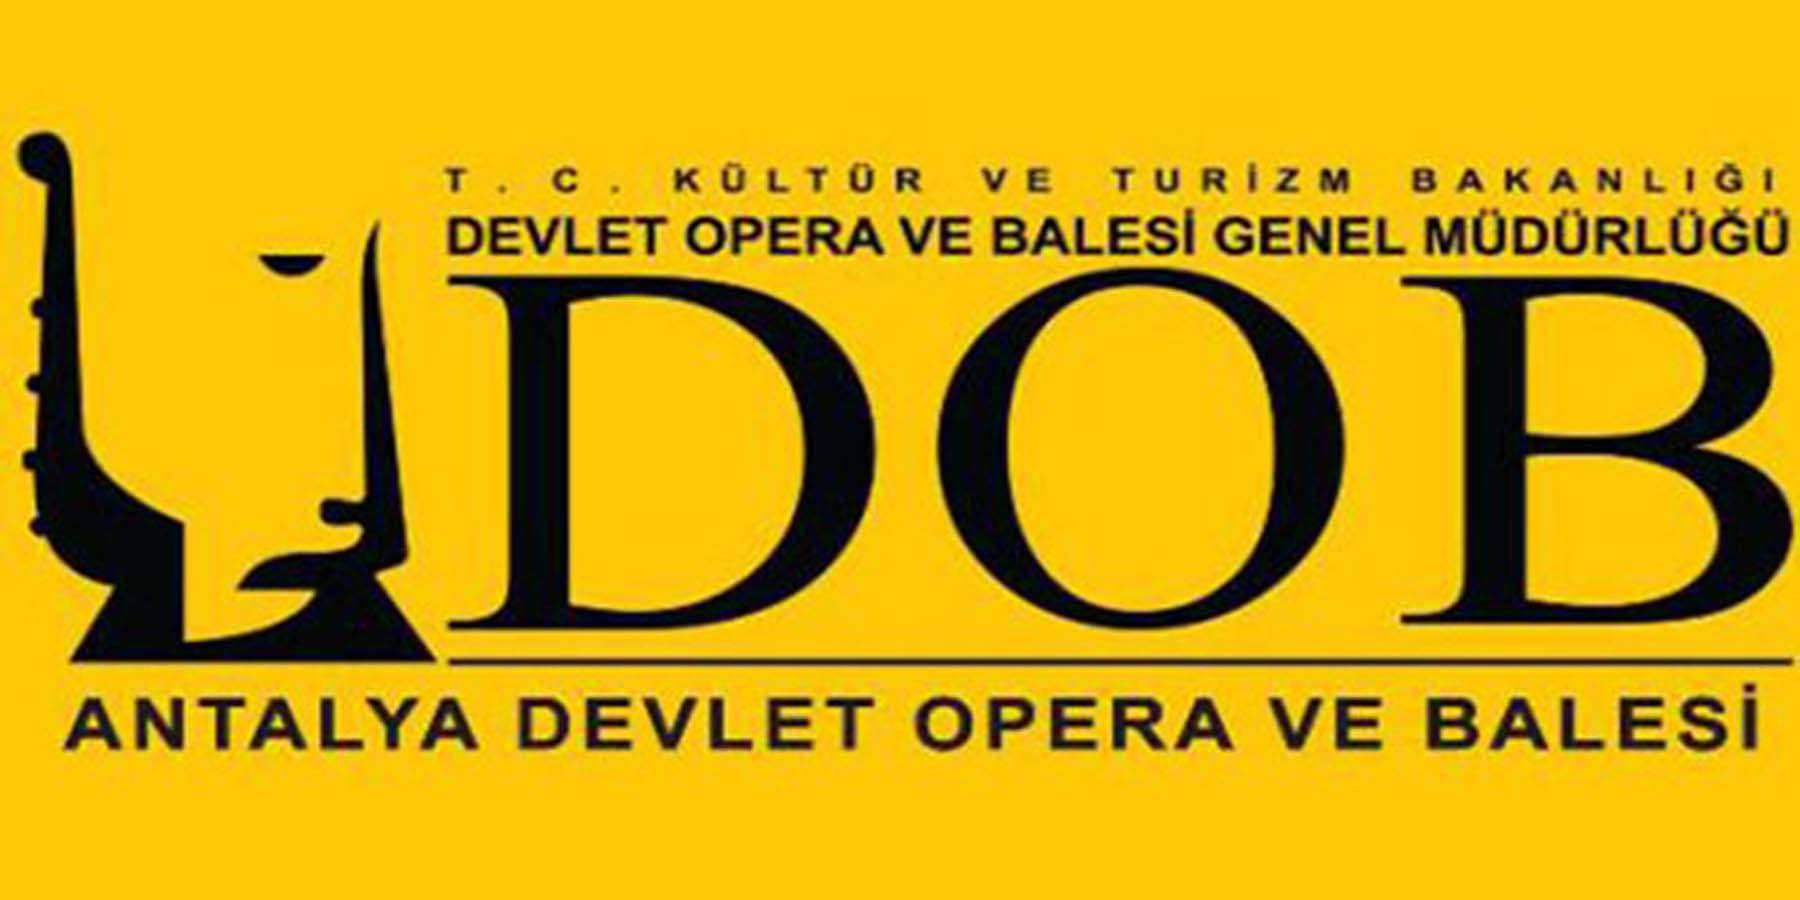 Antalya Devlet Opera ve Bale 2 Kamu Personel Alıyor